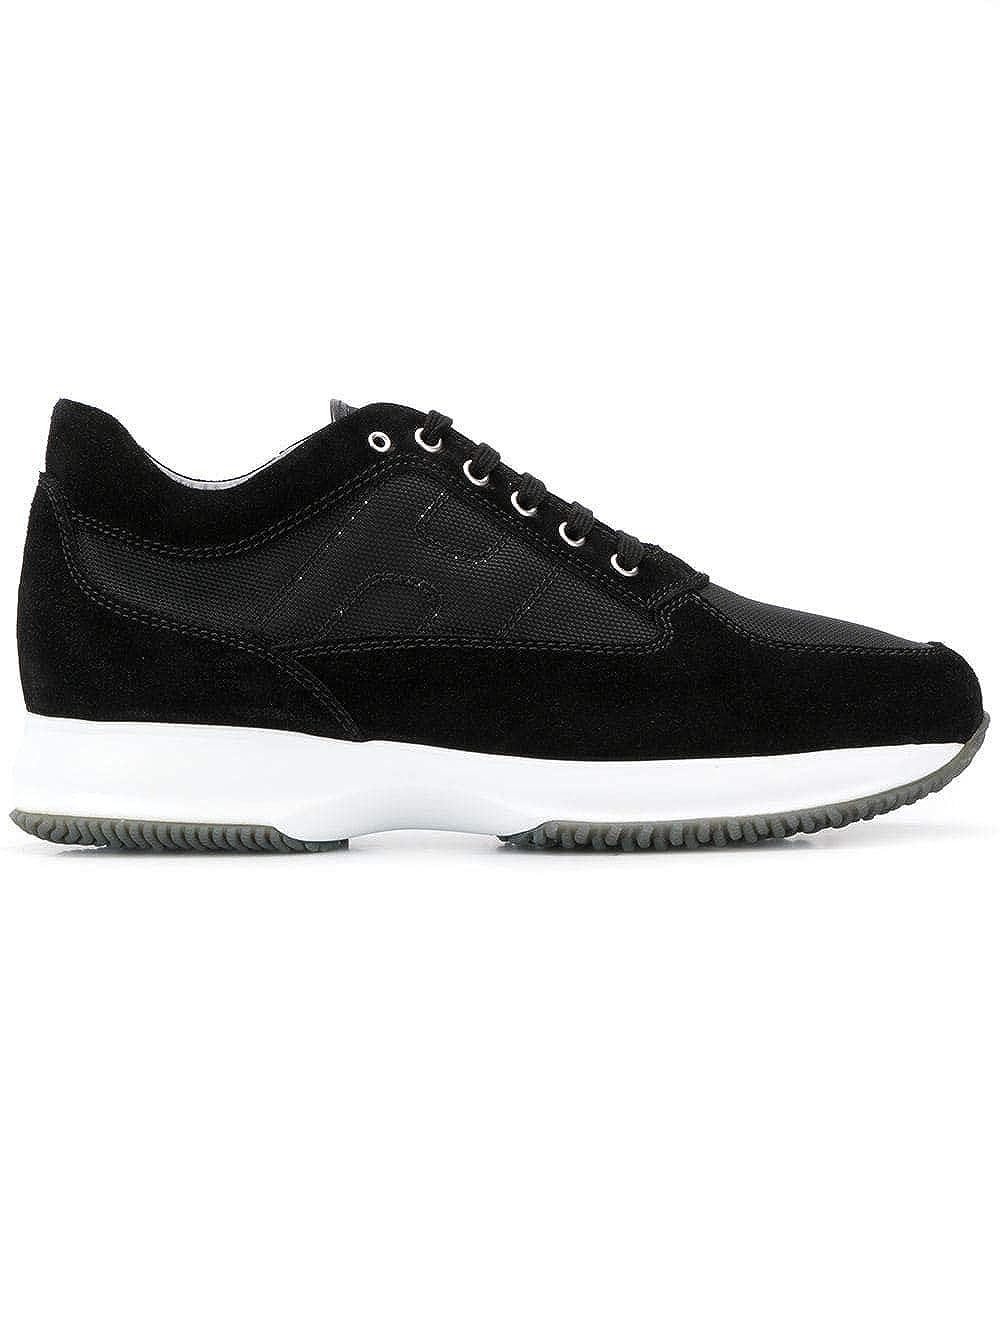 - Hogan Men's HXM00N00E10B2AB999 Black Leather Sneakers